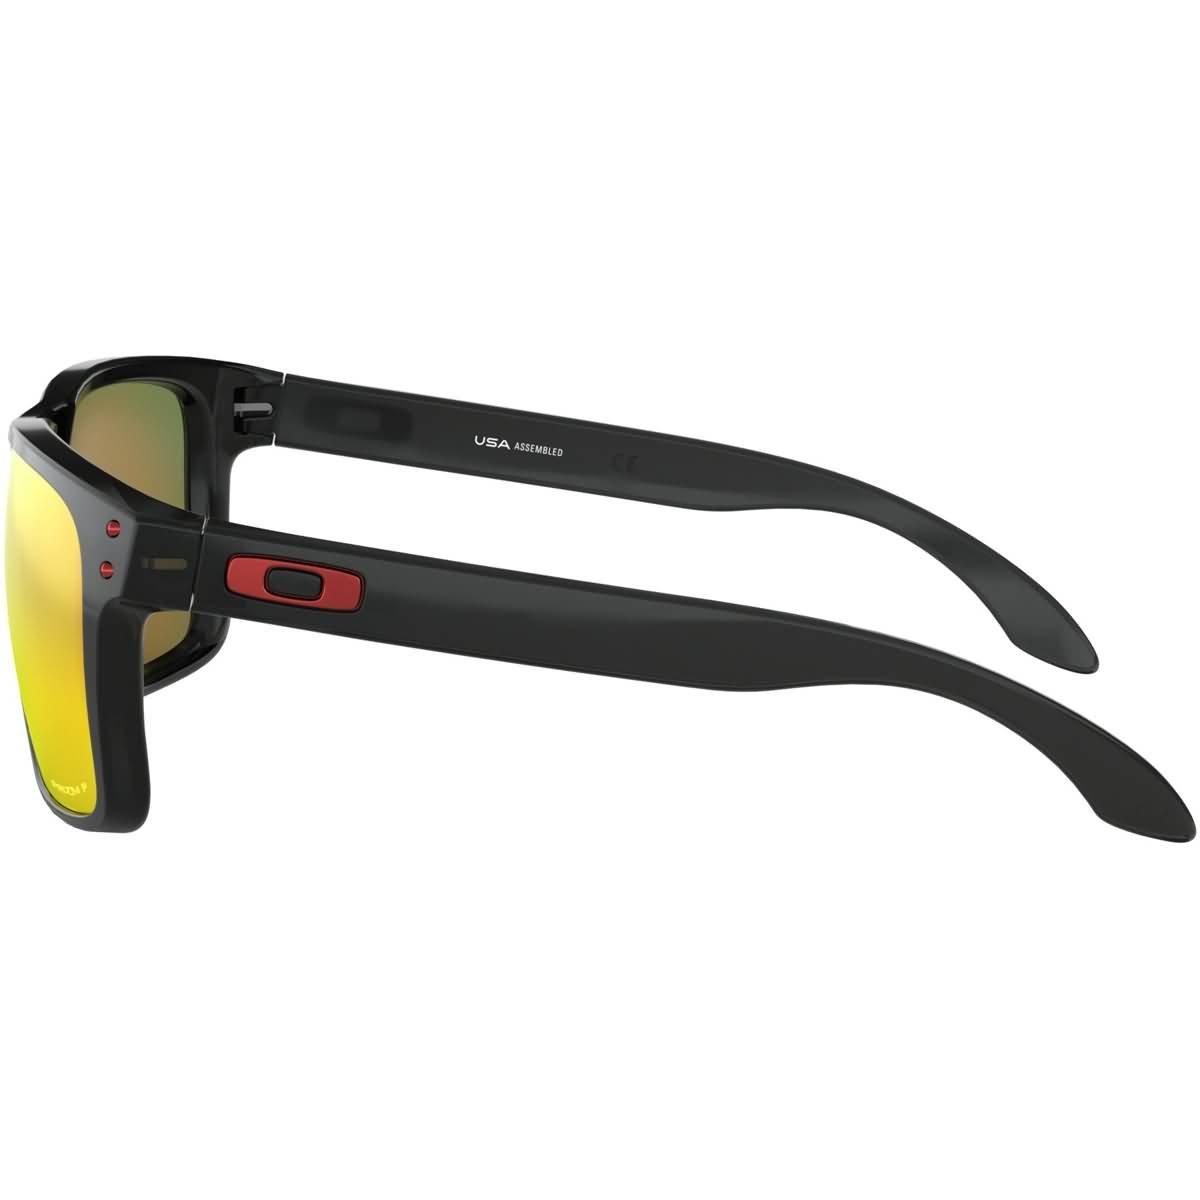 67d9d2291 Amazon.com: Oakley Men's Holbrook XL Polarized Iridium Square Sunglasses,  Black Ink, 59.0 mm: Clothing